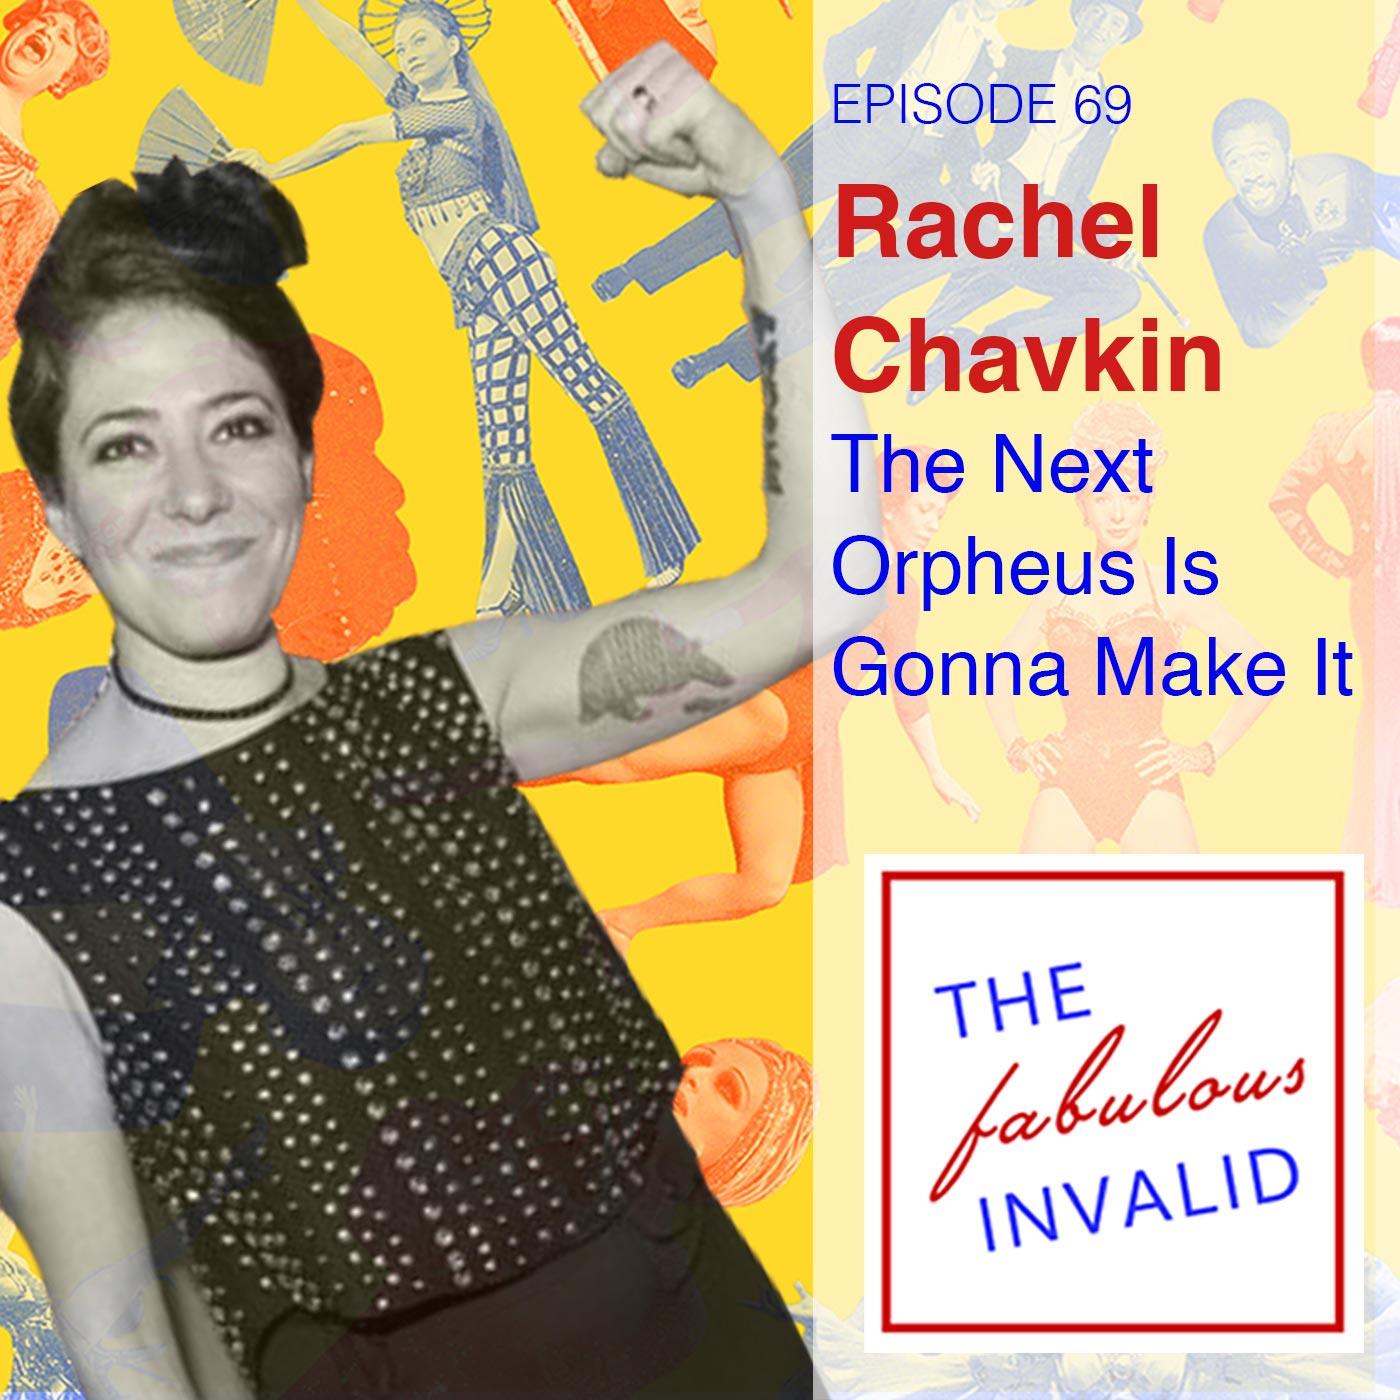 Fabulous Invalid Episode 69 Rachel Chavkin